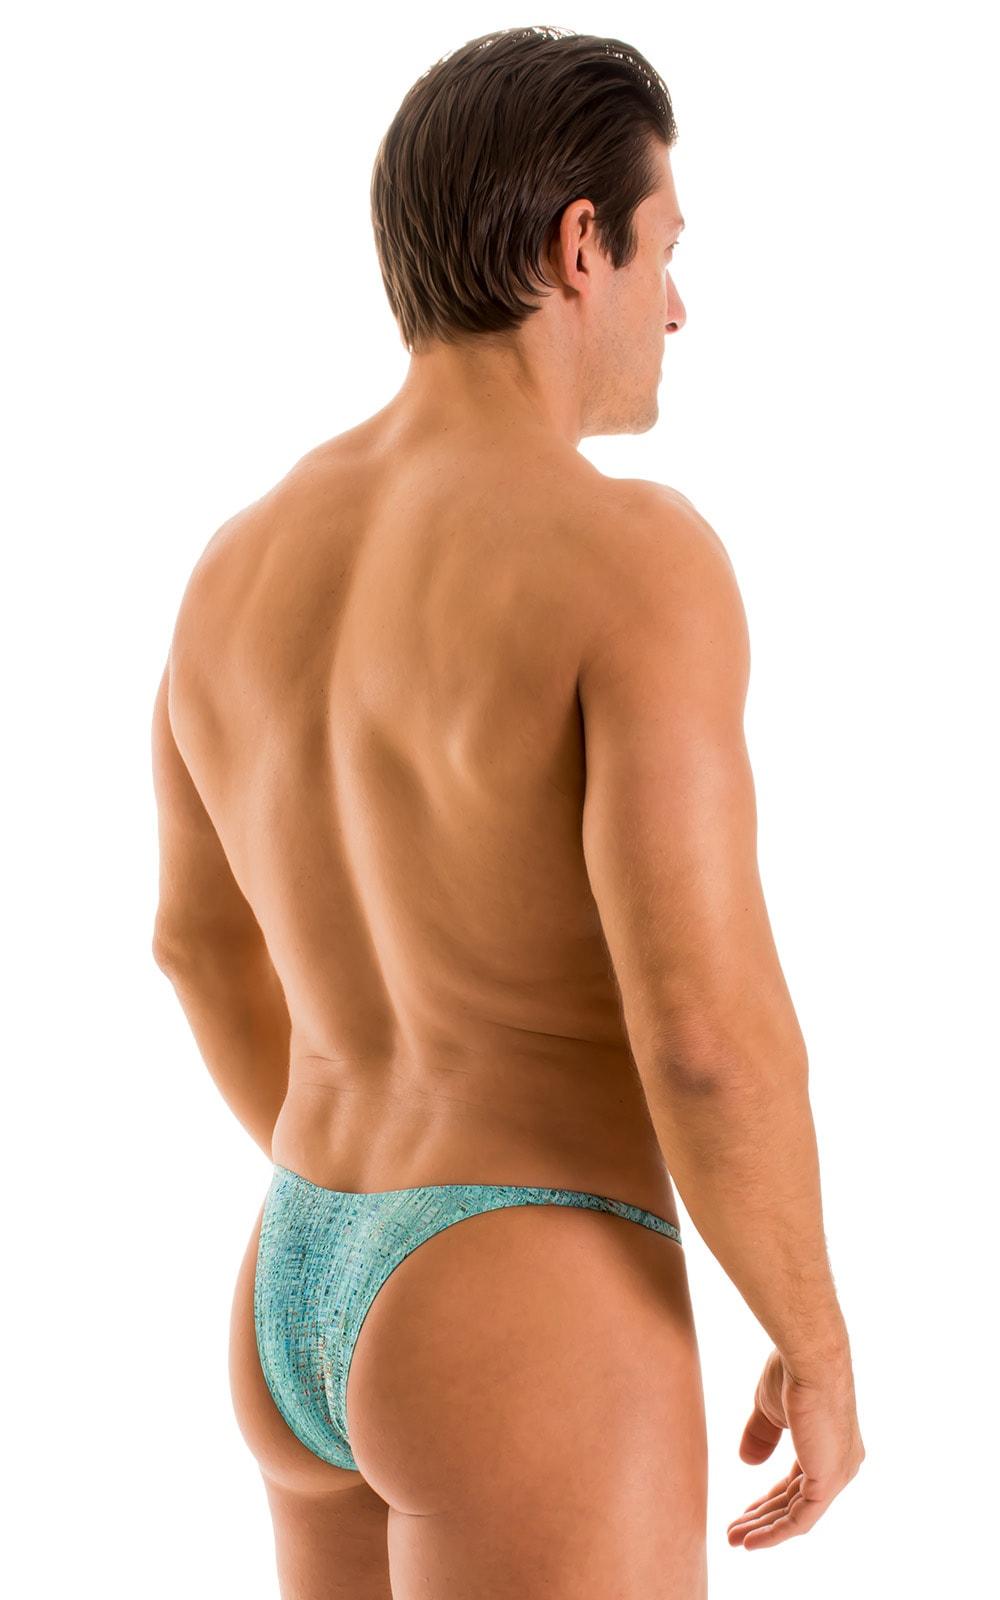 Sunseeker Micro Pouch Half Back Bikini in Super ThinSKINZ Seafoam Circuits 2